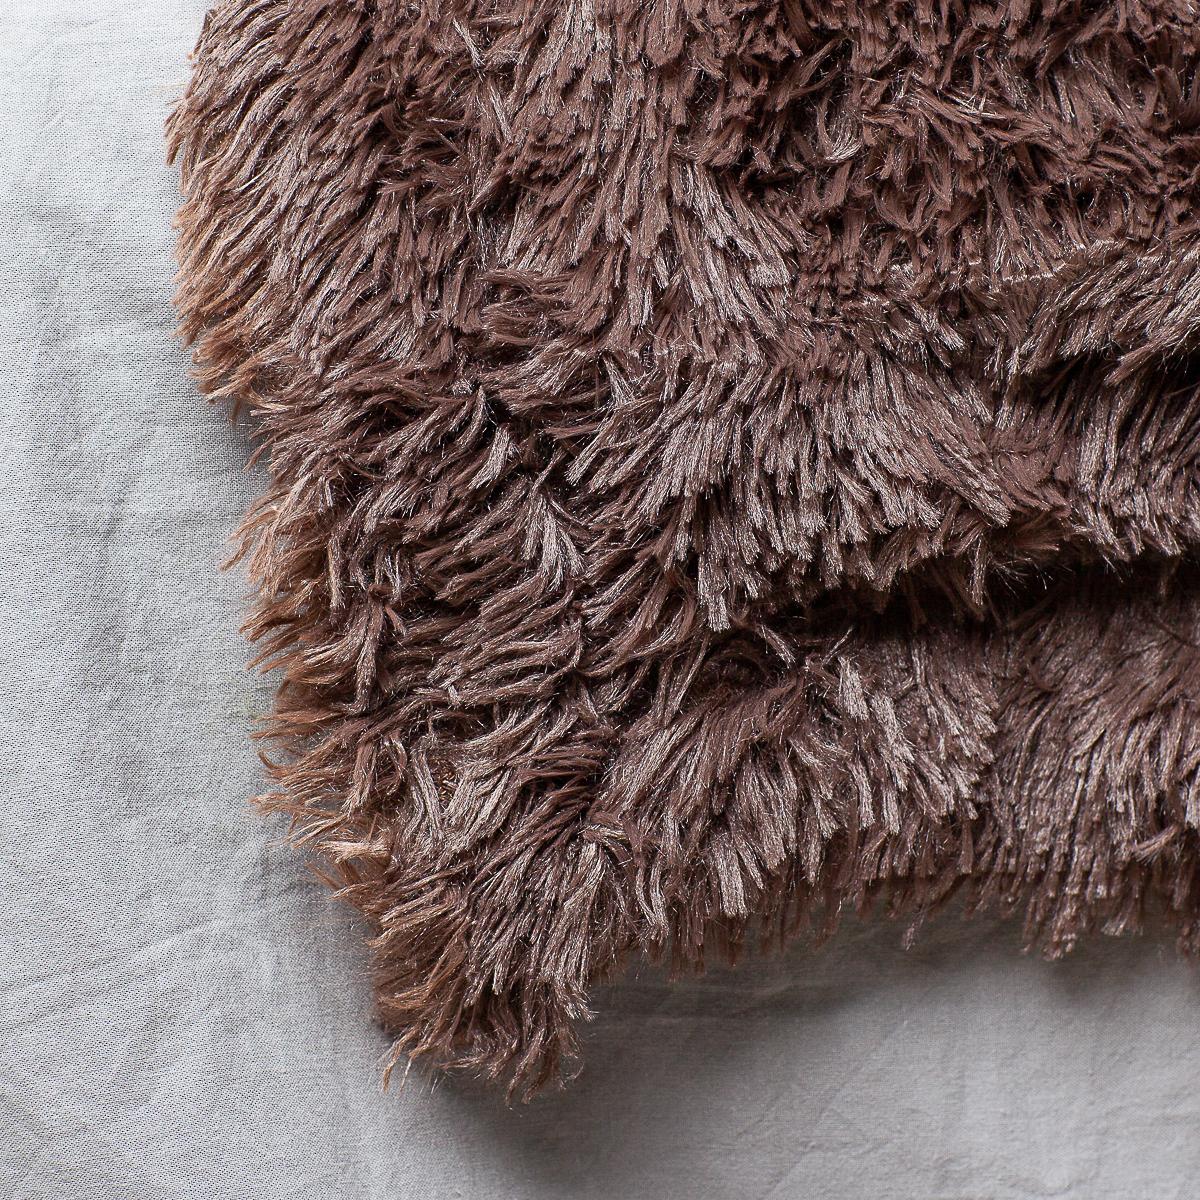 Коврик придверный SunStep Welcome, 60 х 40 см коврик придверный sunstep spongy welcome цвет серый 90 х 60 см